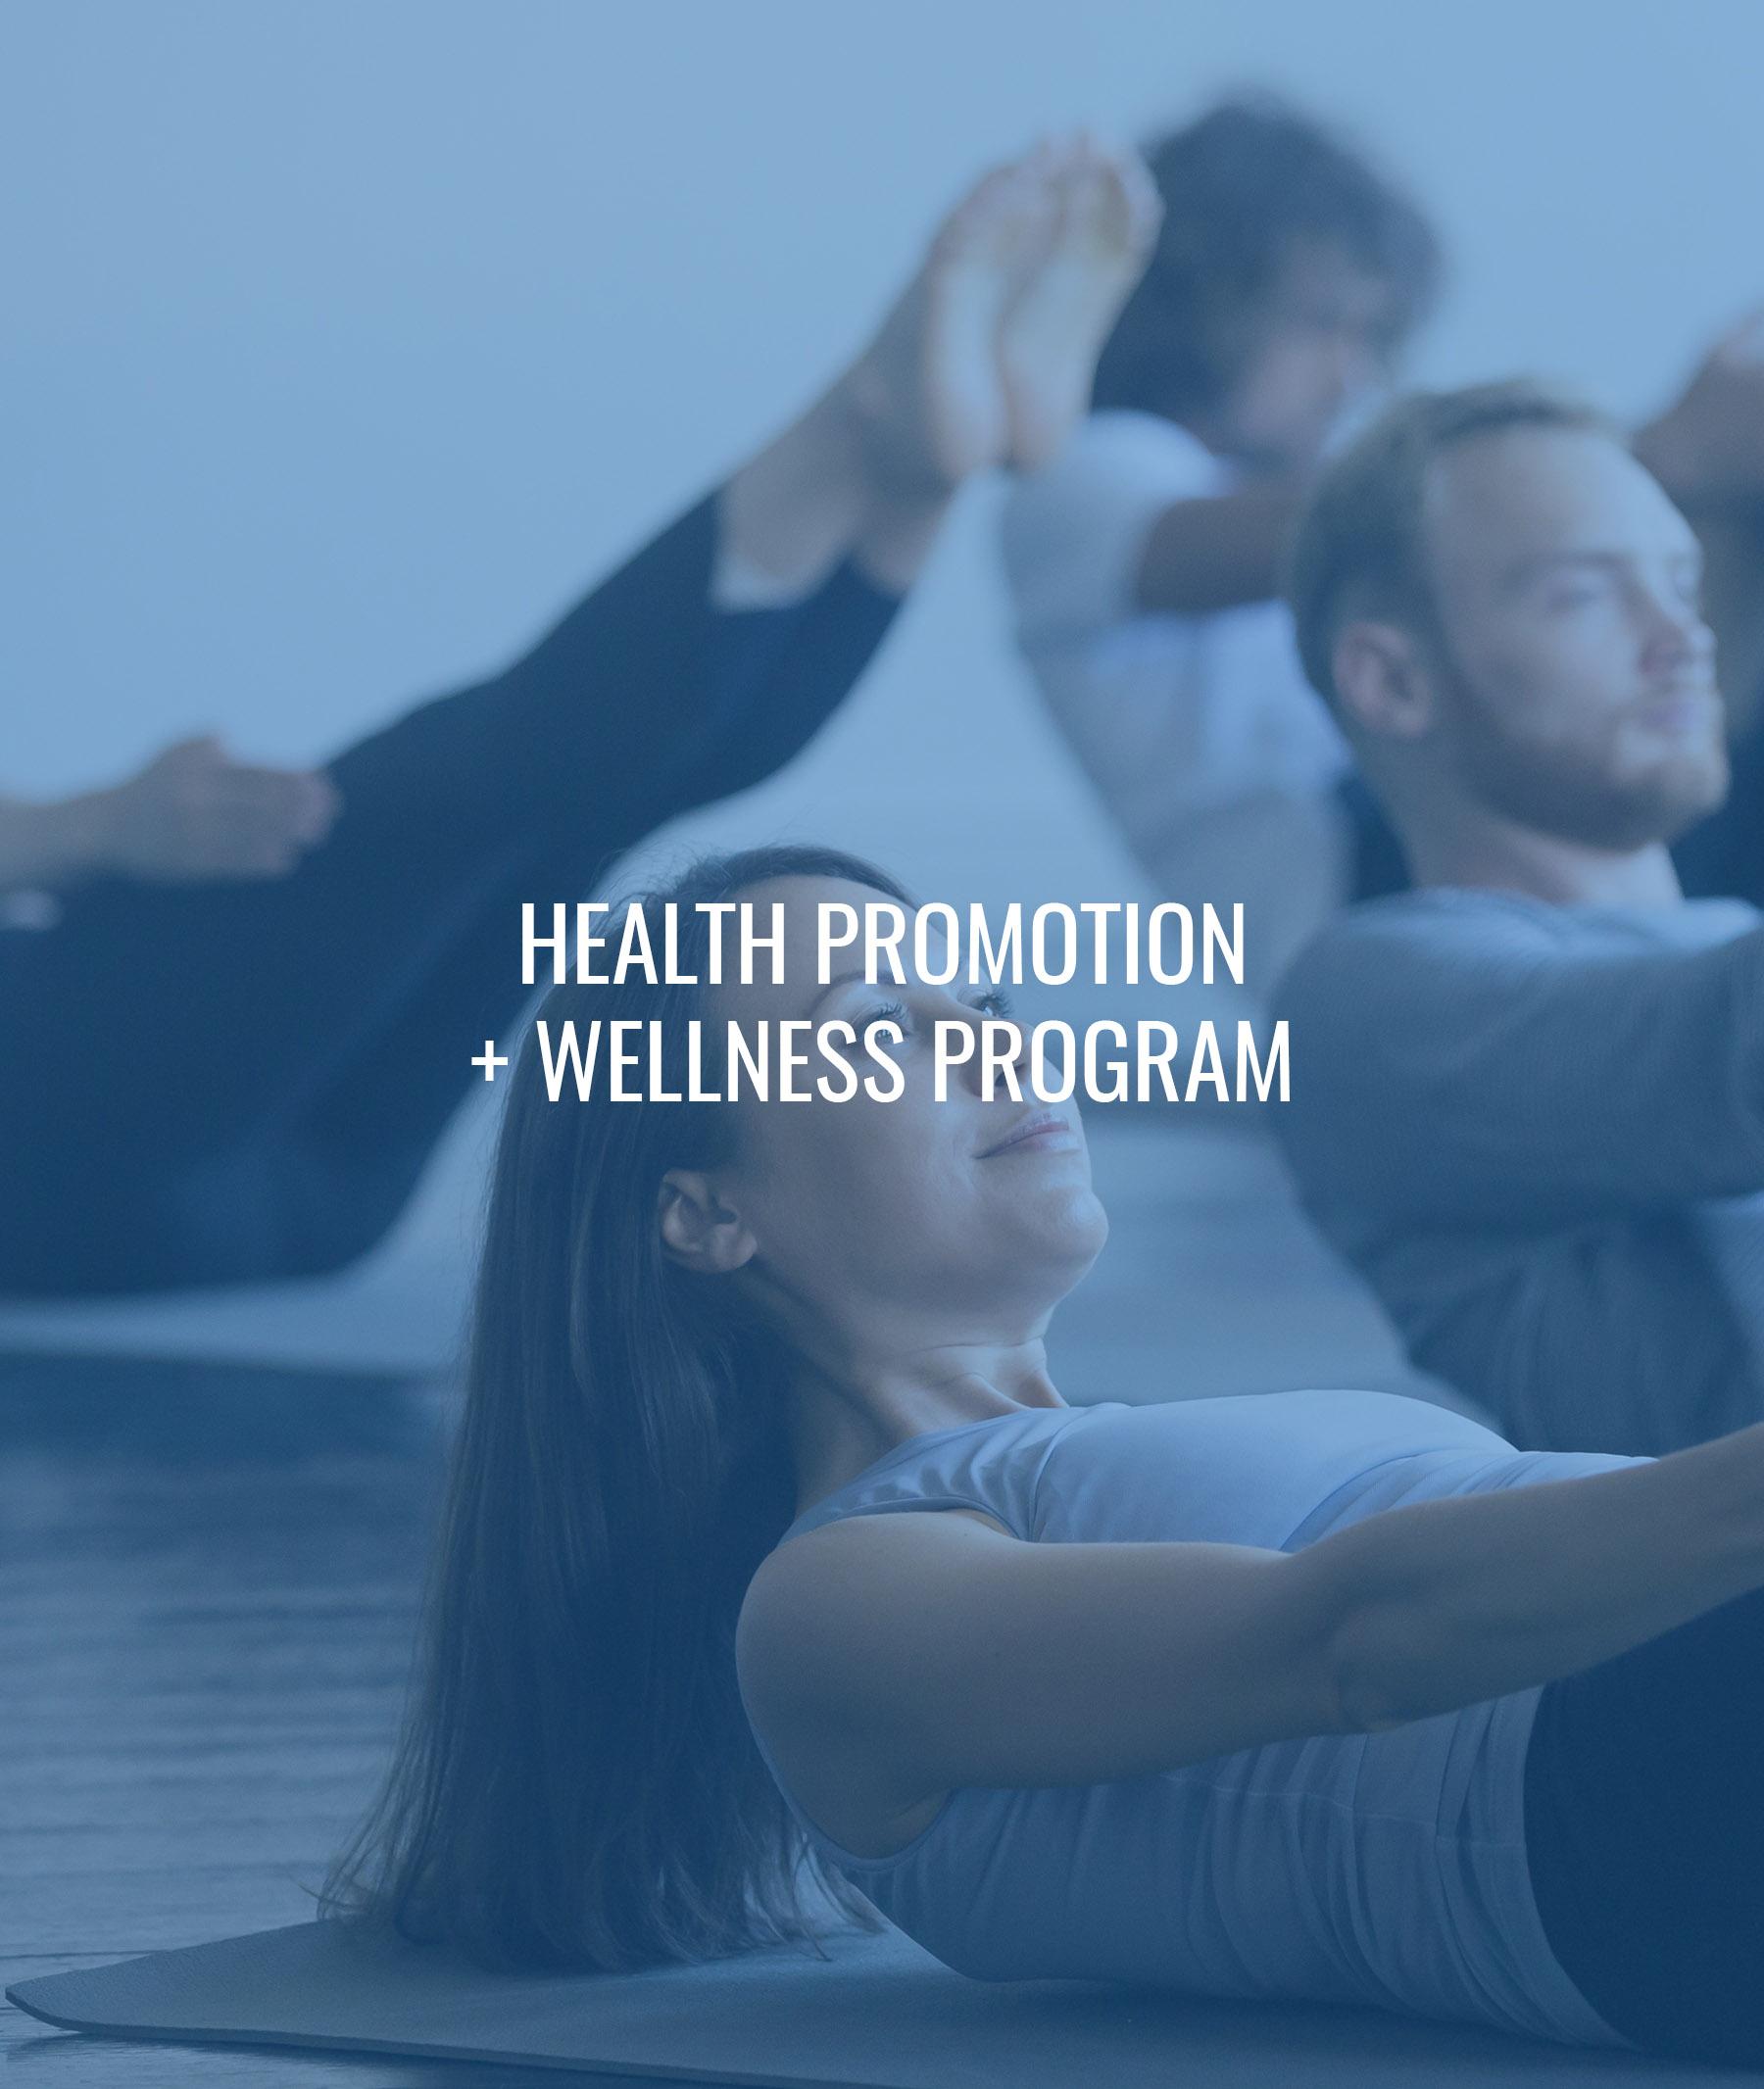 whi_healthpromotionandwellness-5.jpg